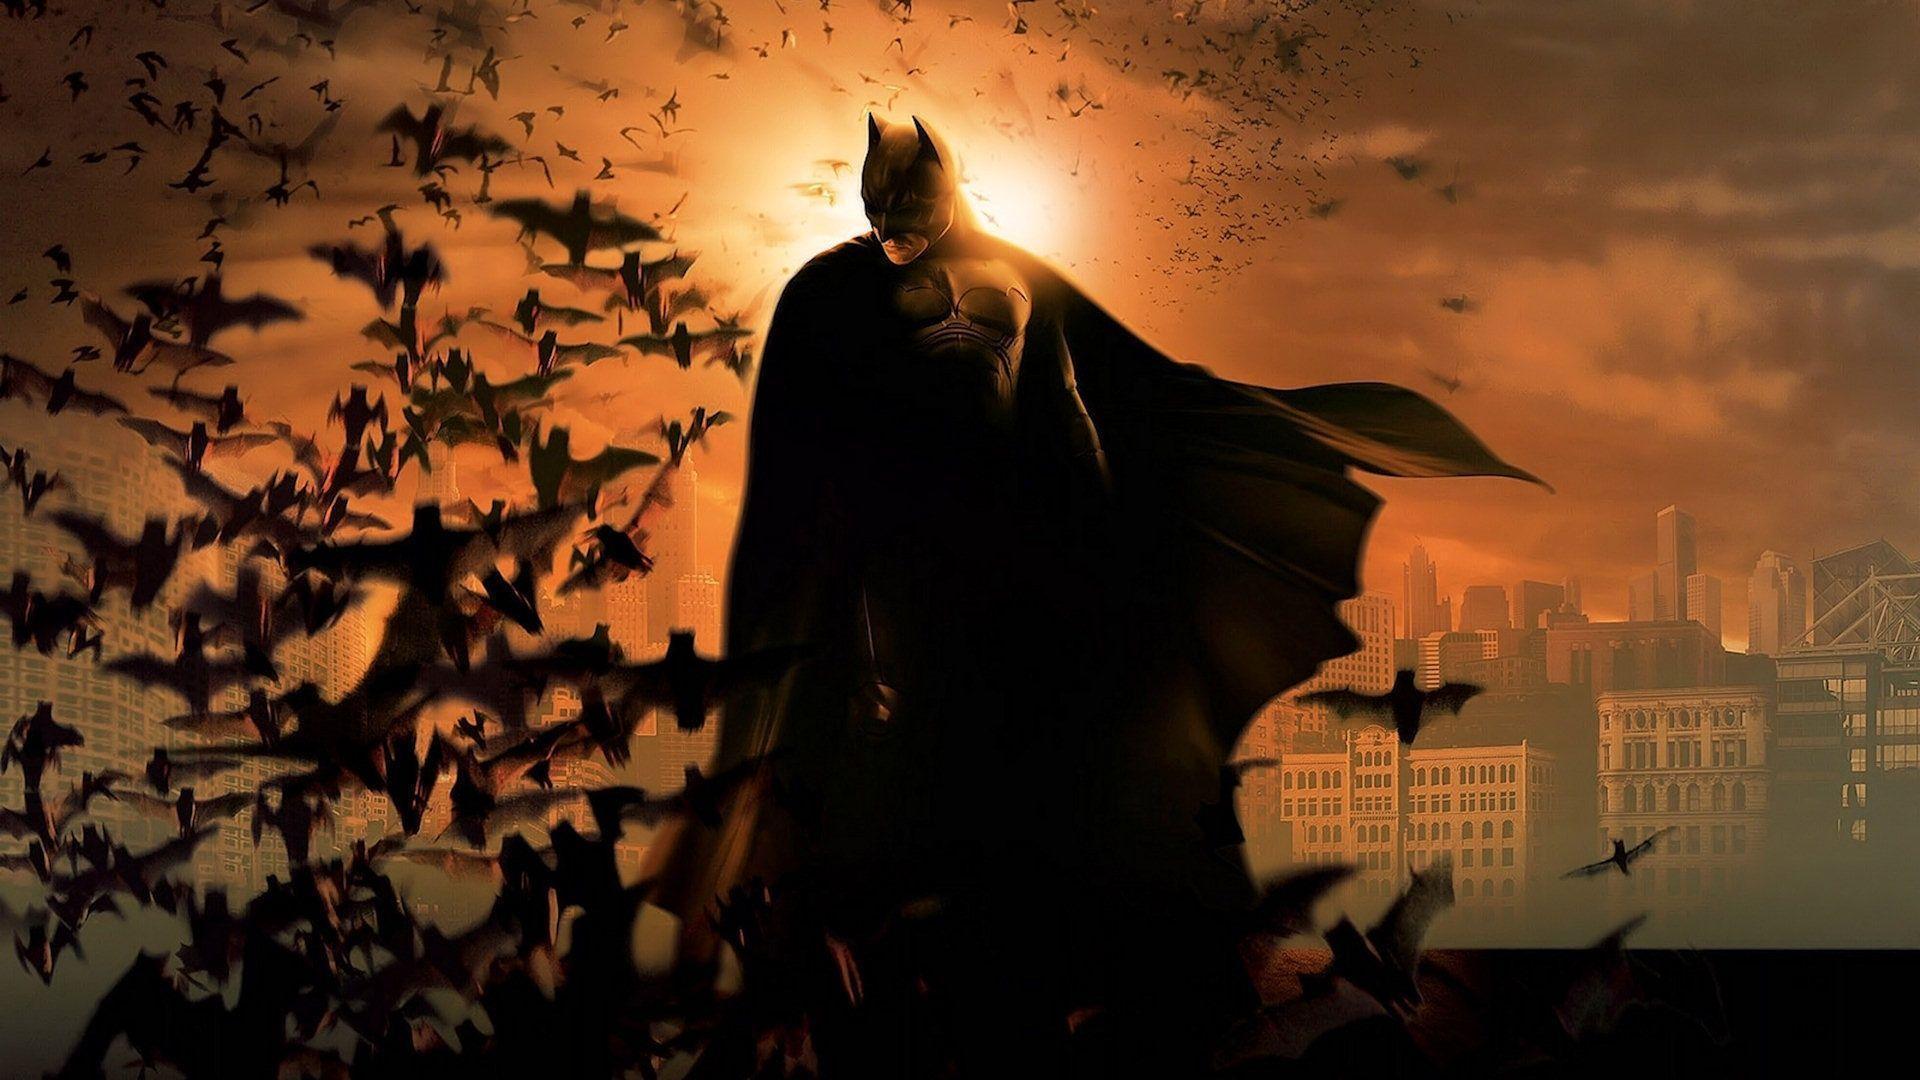 Batman wallpaper hd Ideas for You